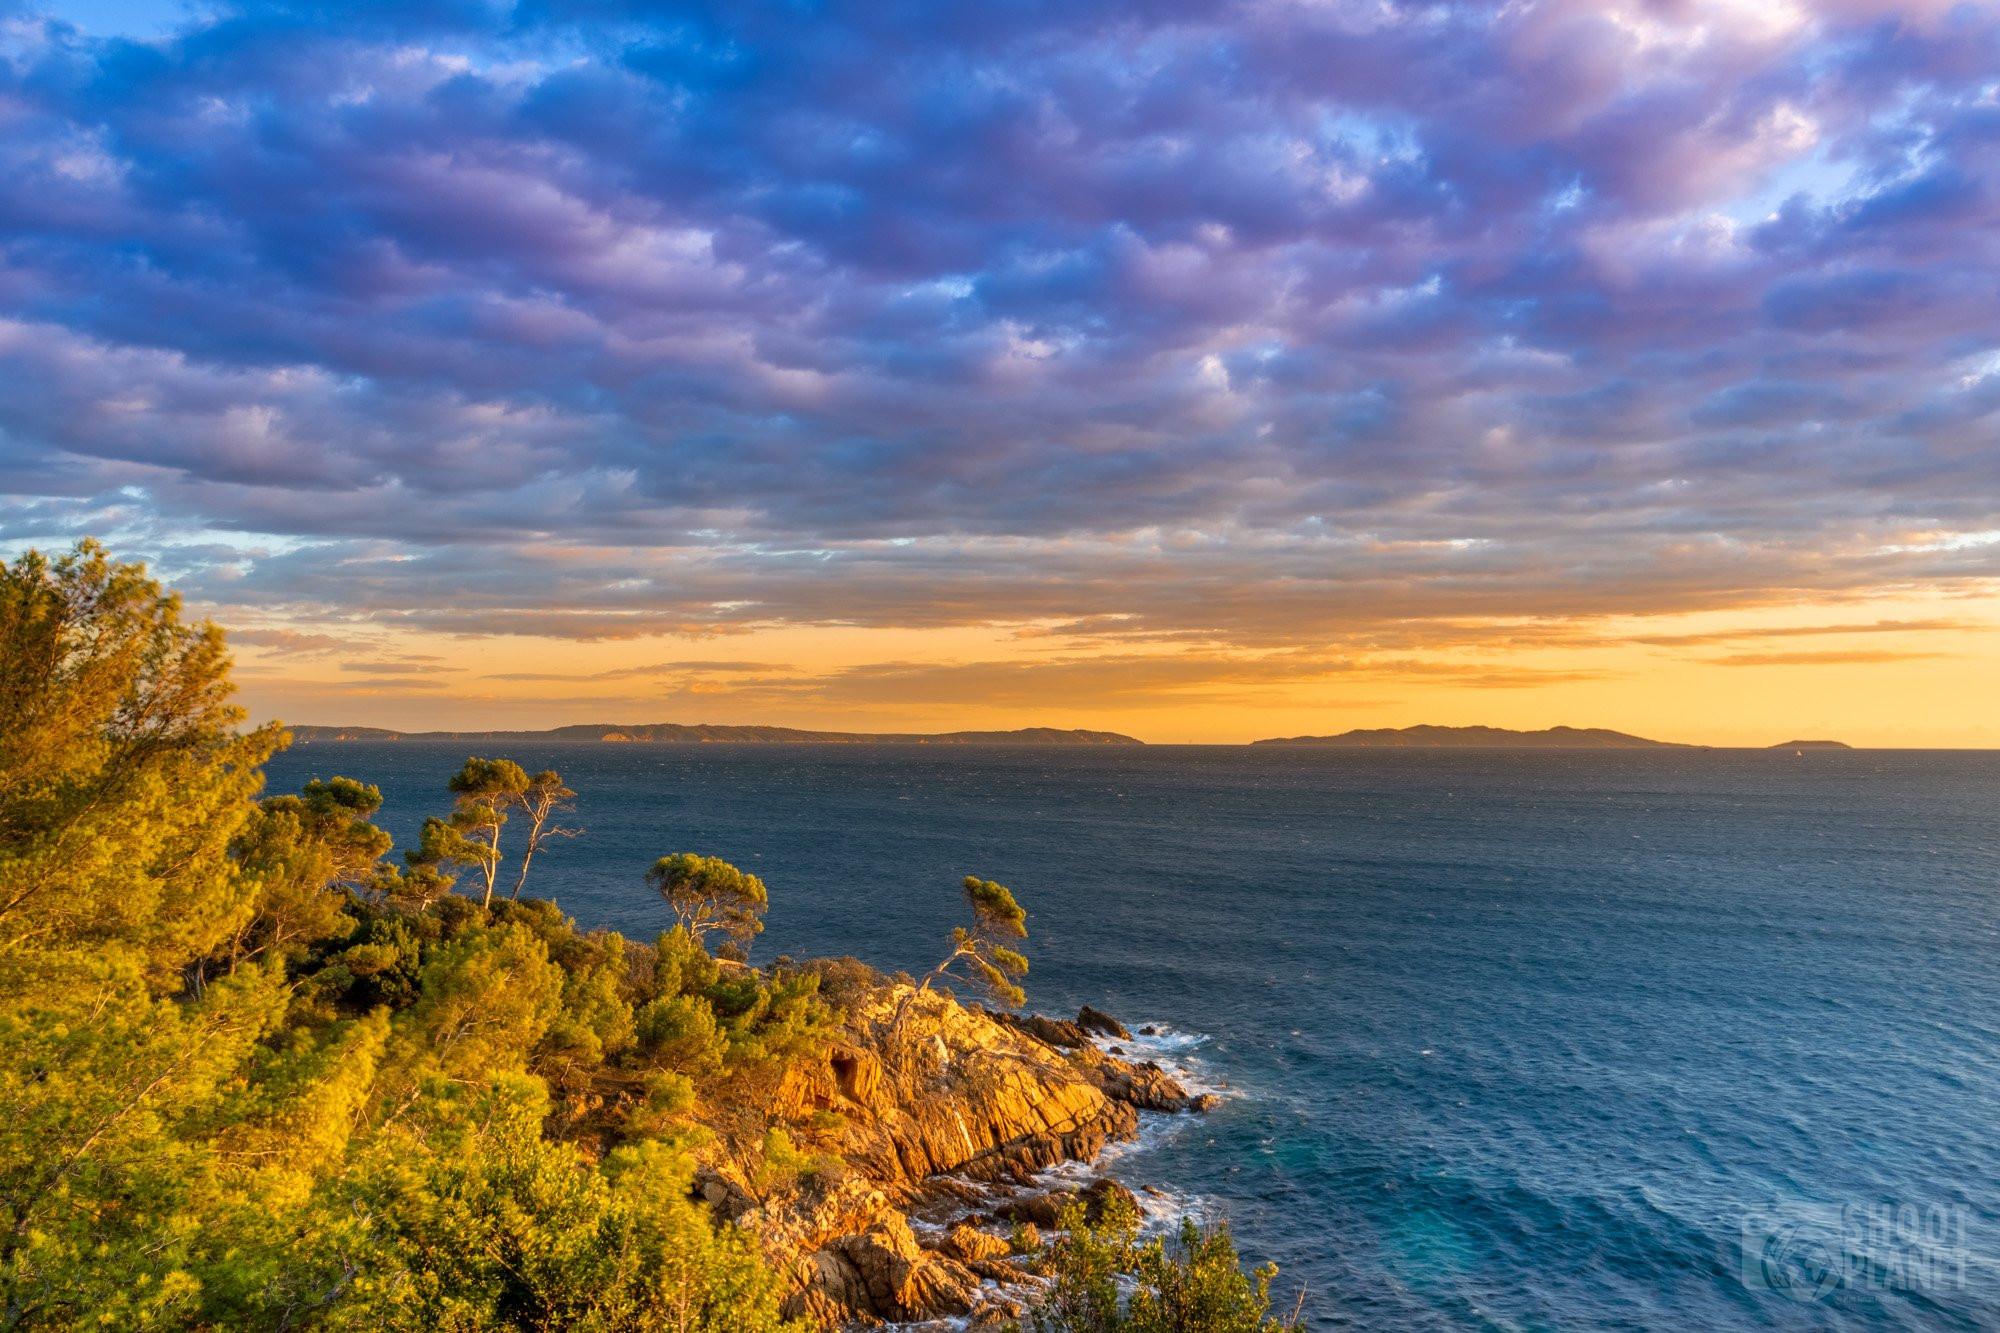 Sunset on golden islands, Azure Coast France